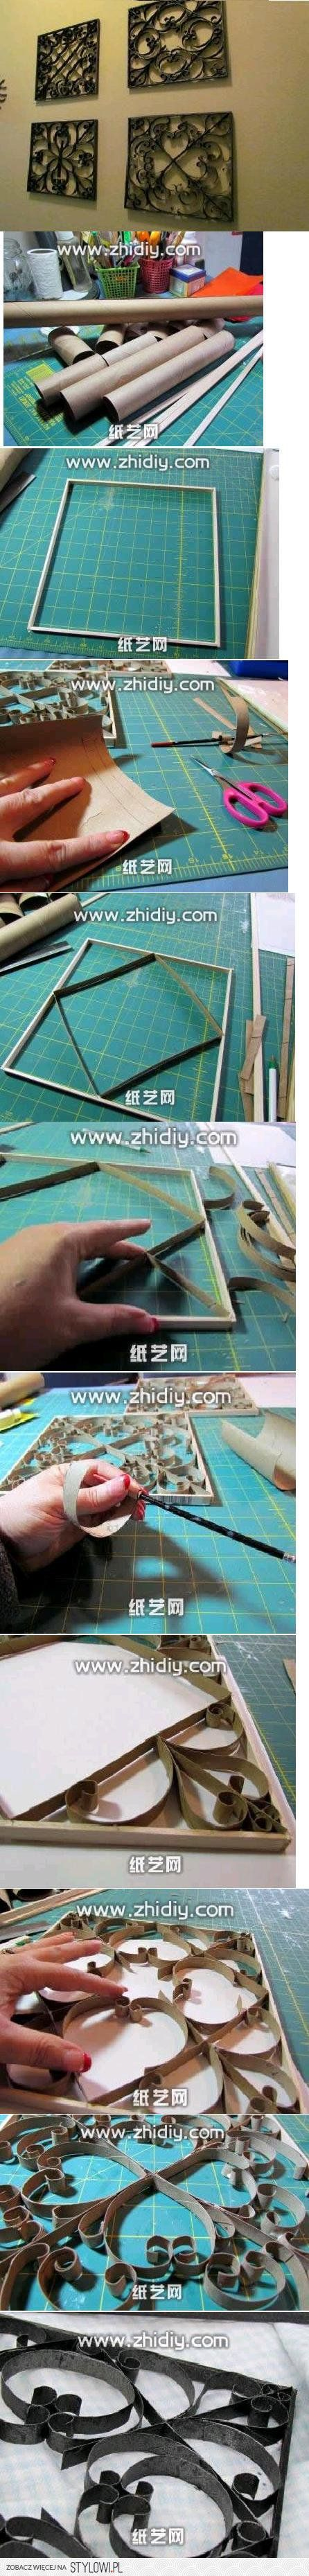 DIY Toilet Paper Roll Decorative Frame DIY Projects | U…